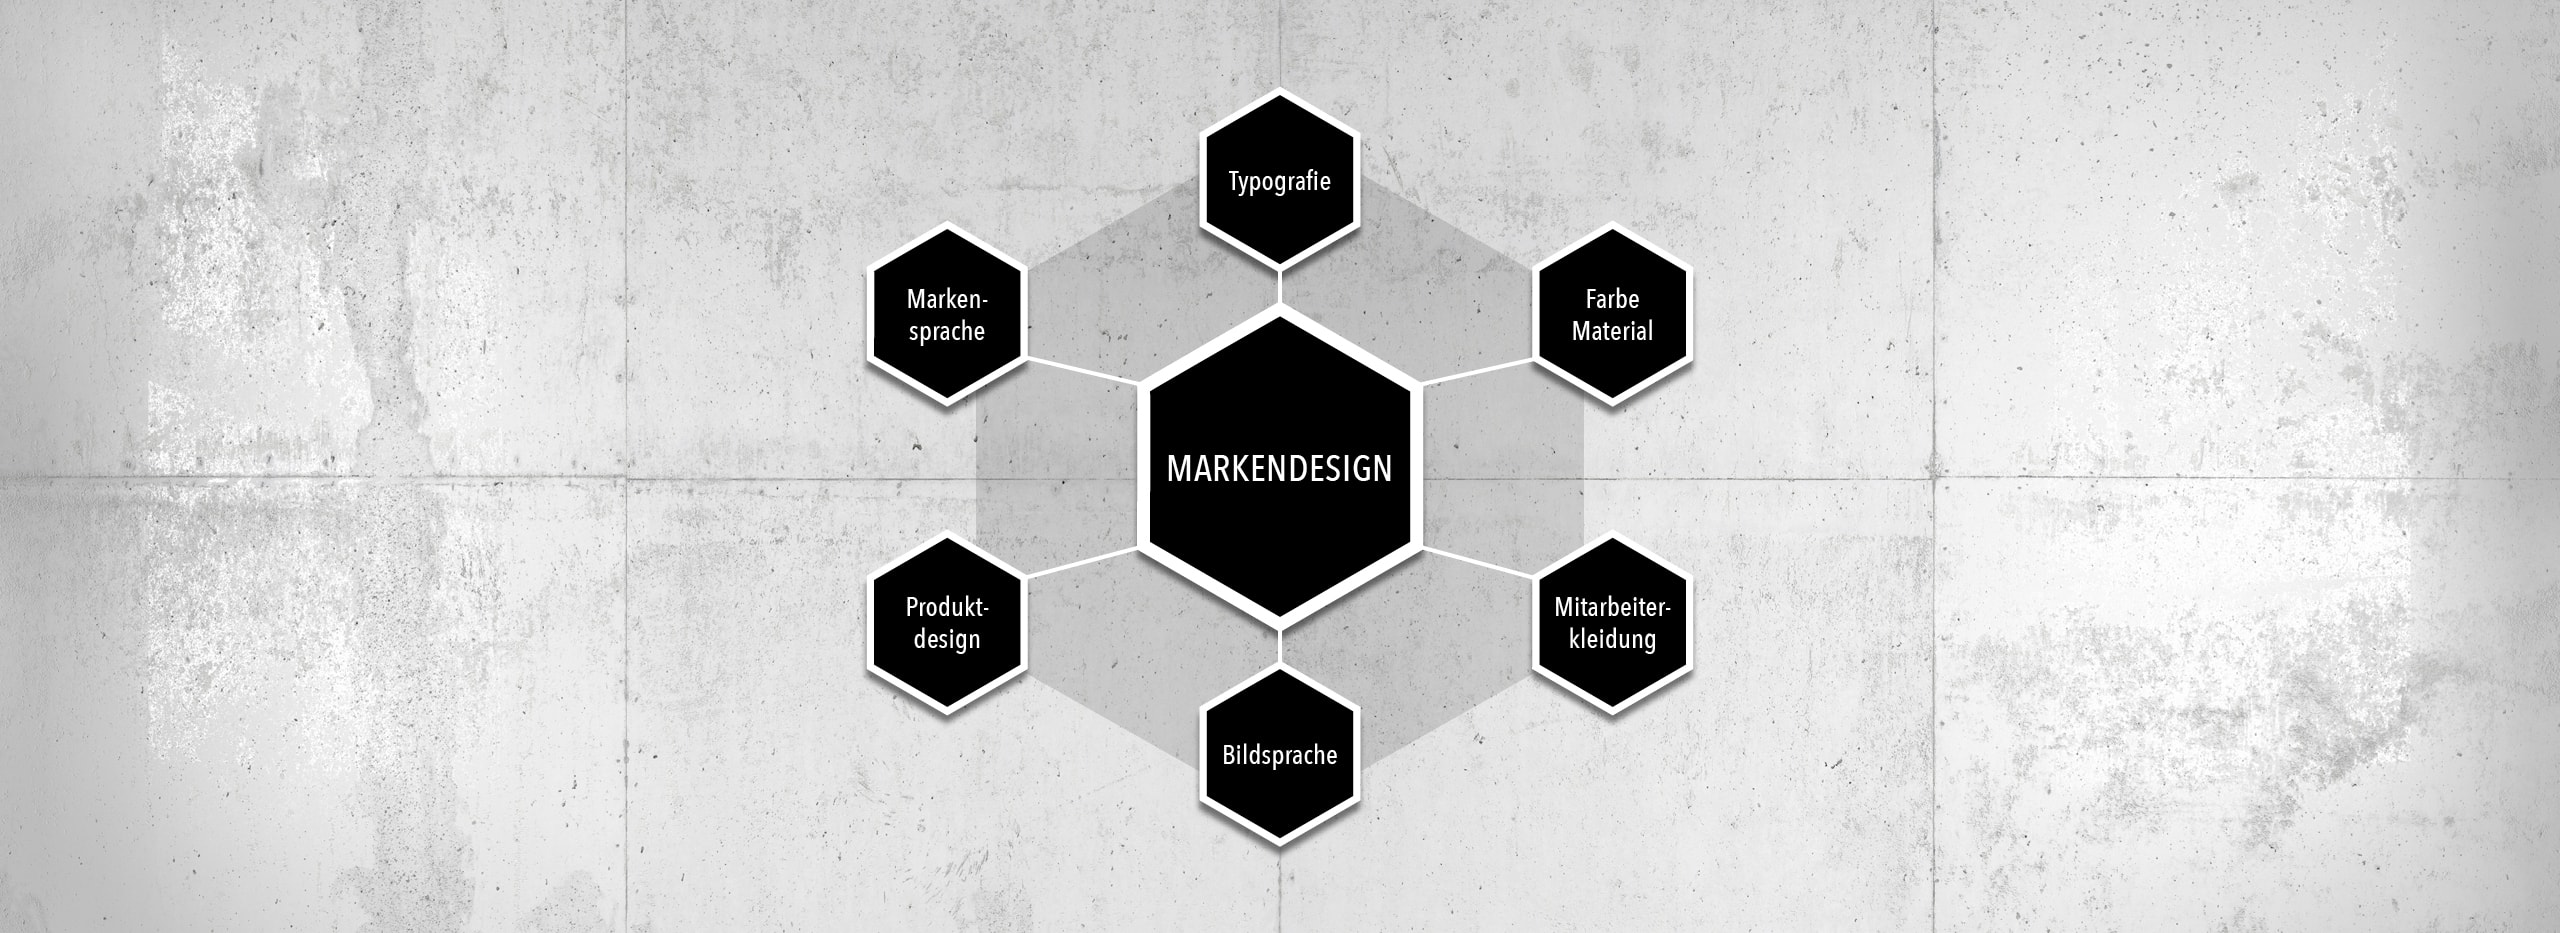 infografik-markendesign-loftagentur